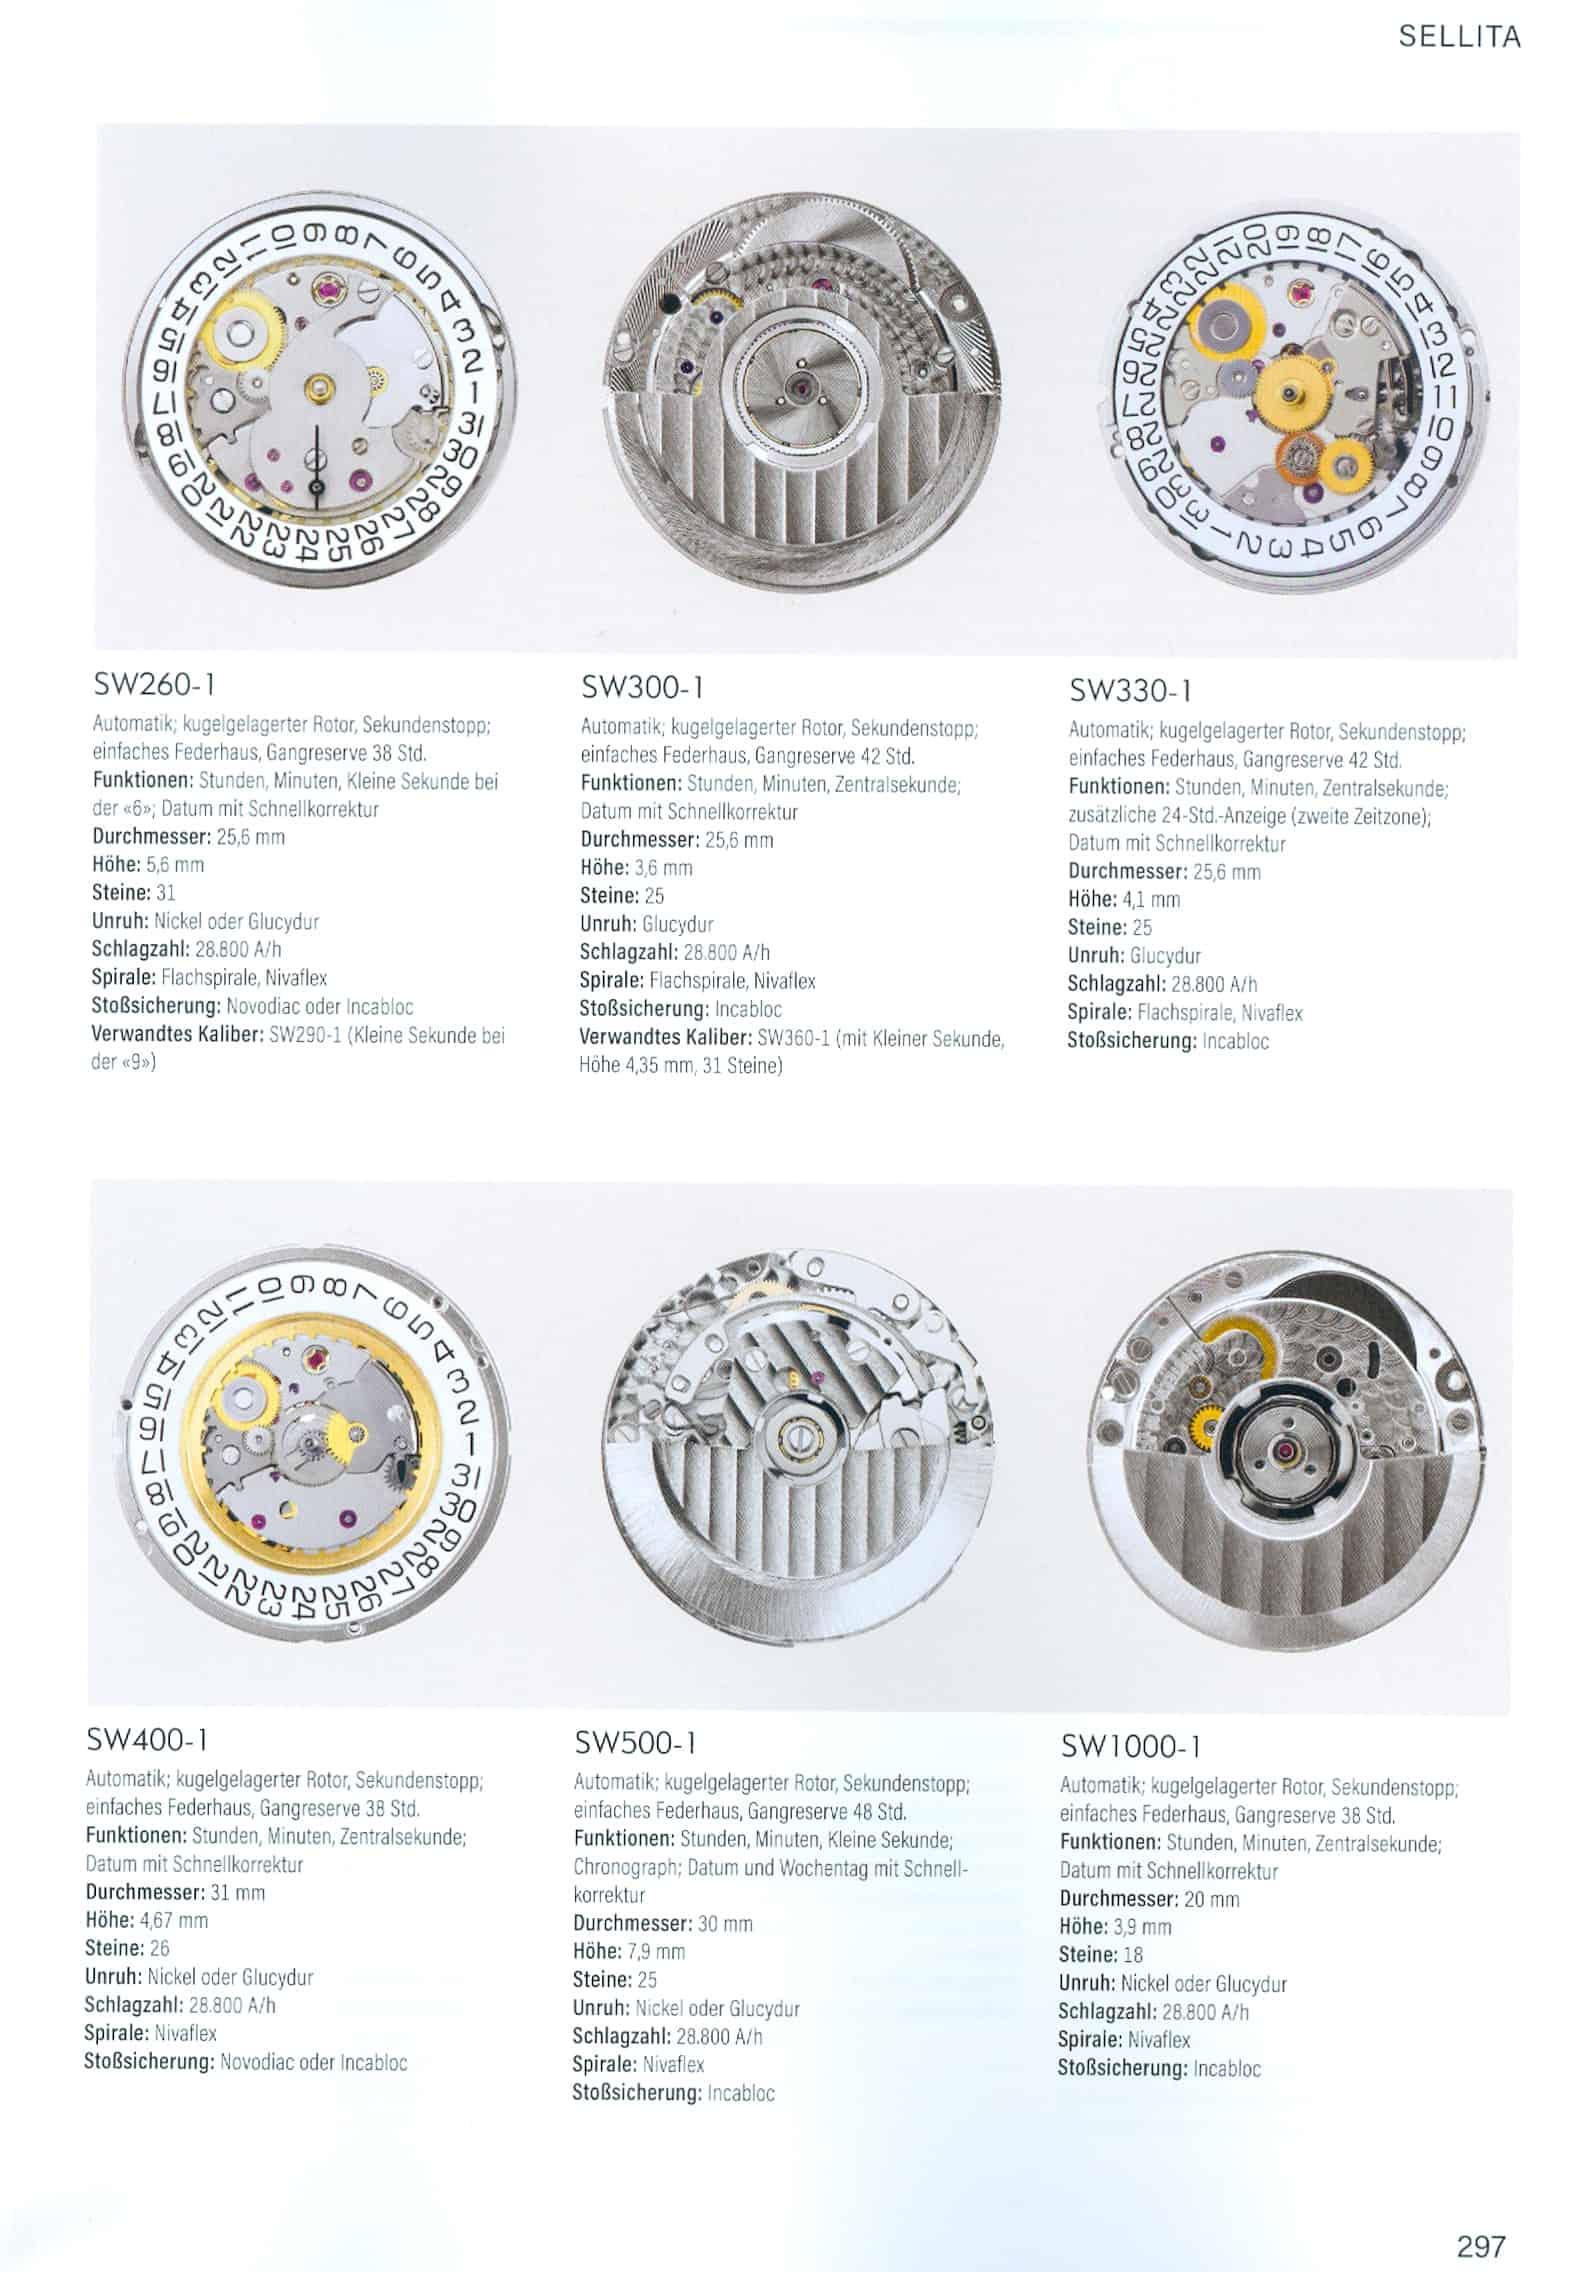 Armbanduhren Katalog Heel Verlag 2020 2021 Sellita